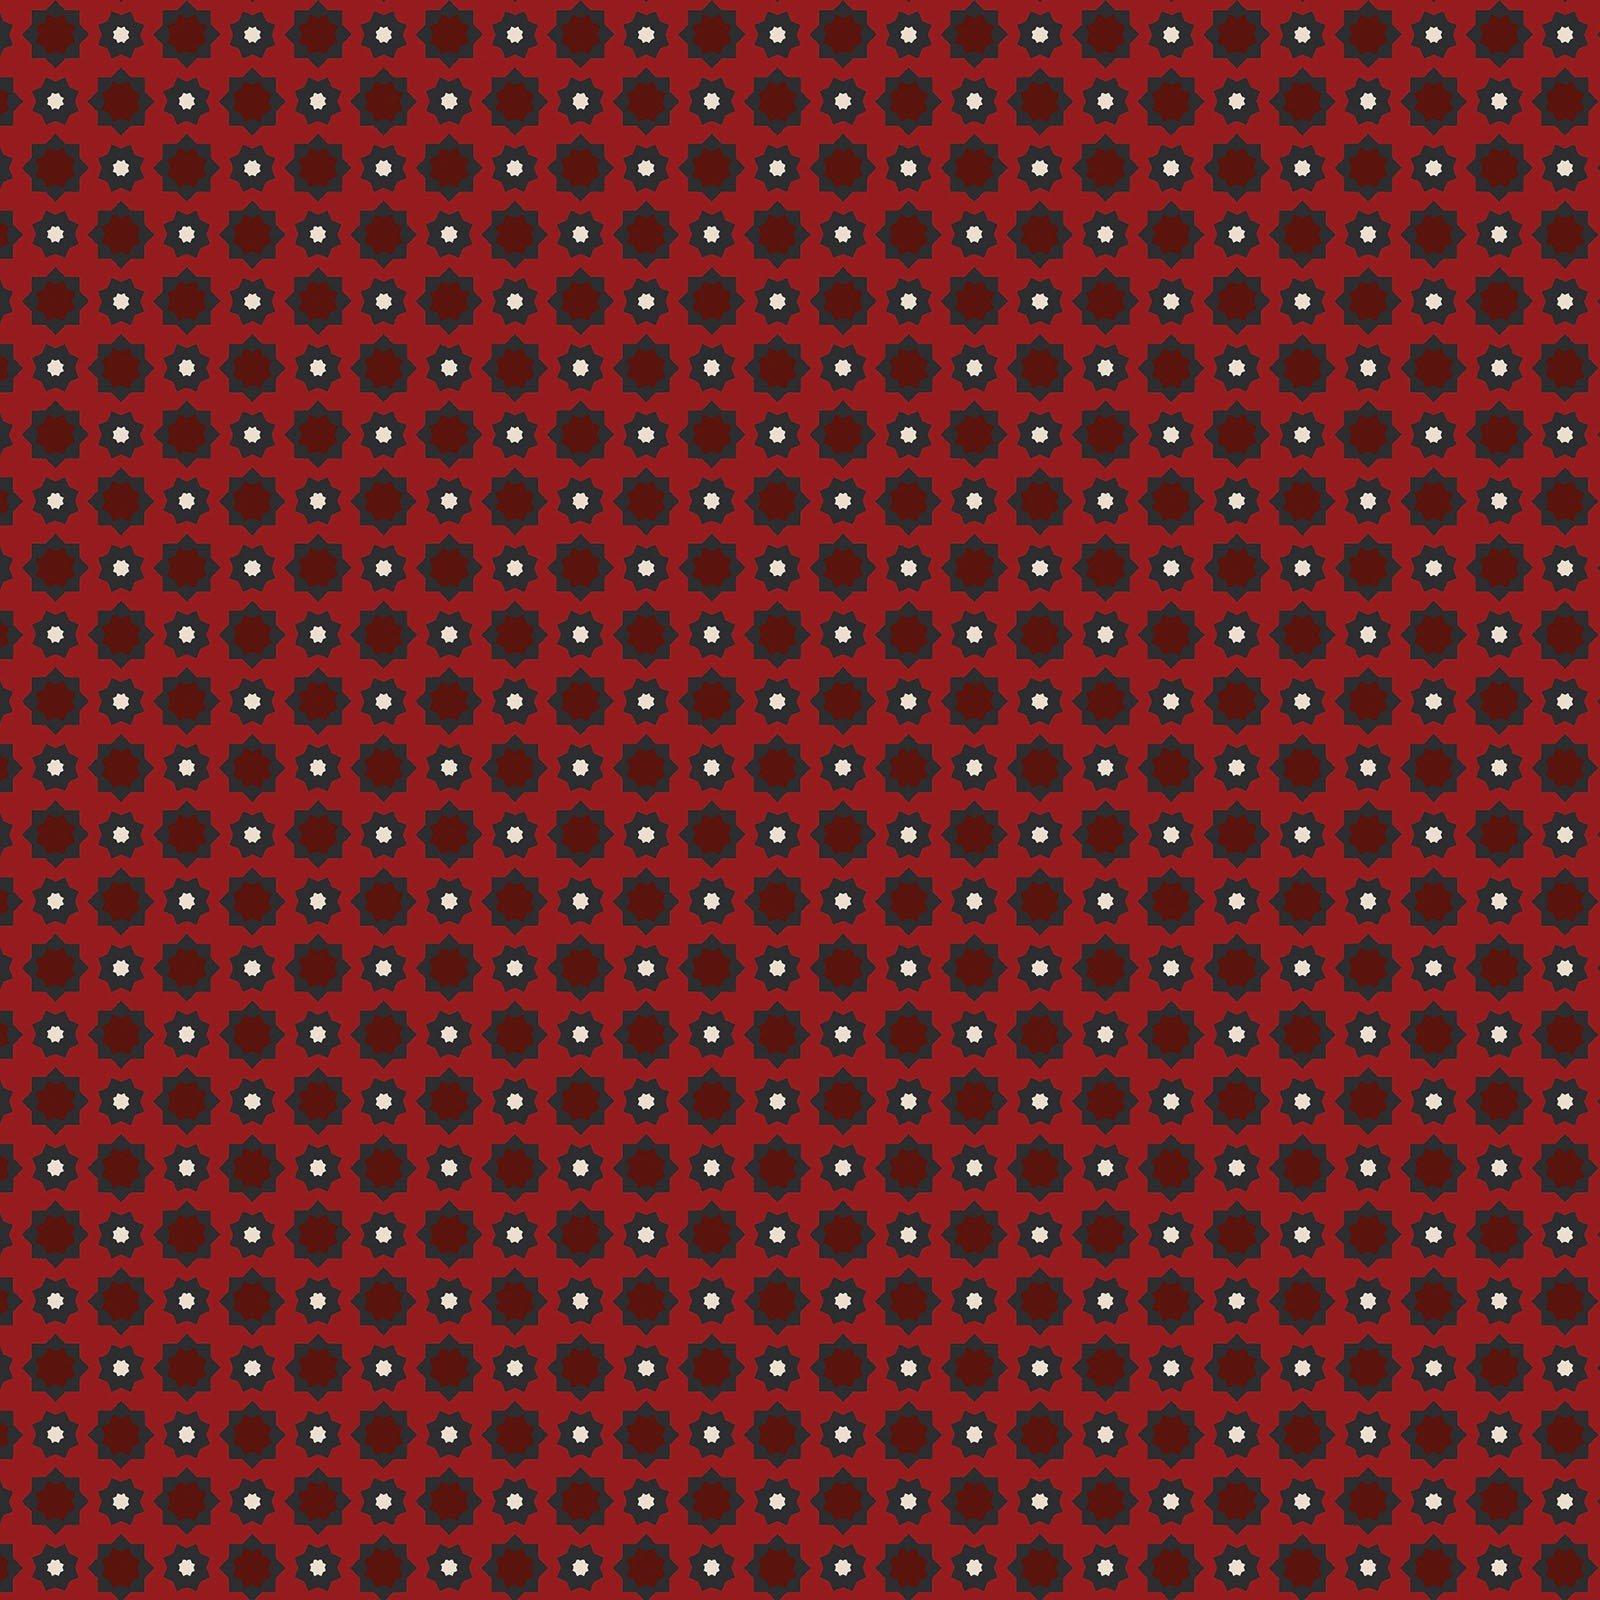 Red Foulard - American Rustic - BEN6338-10